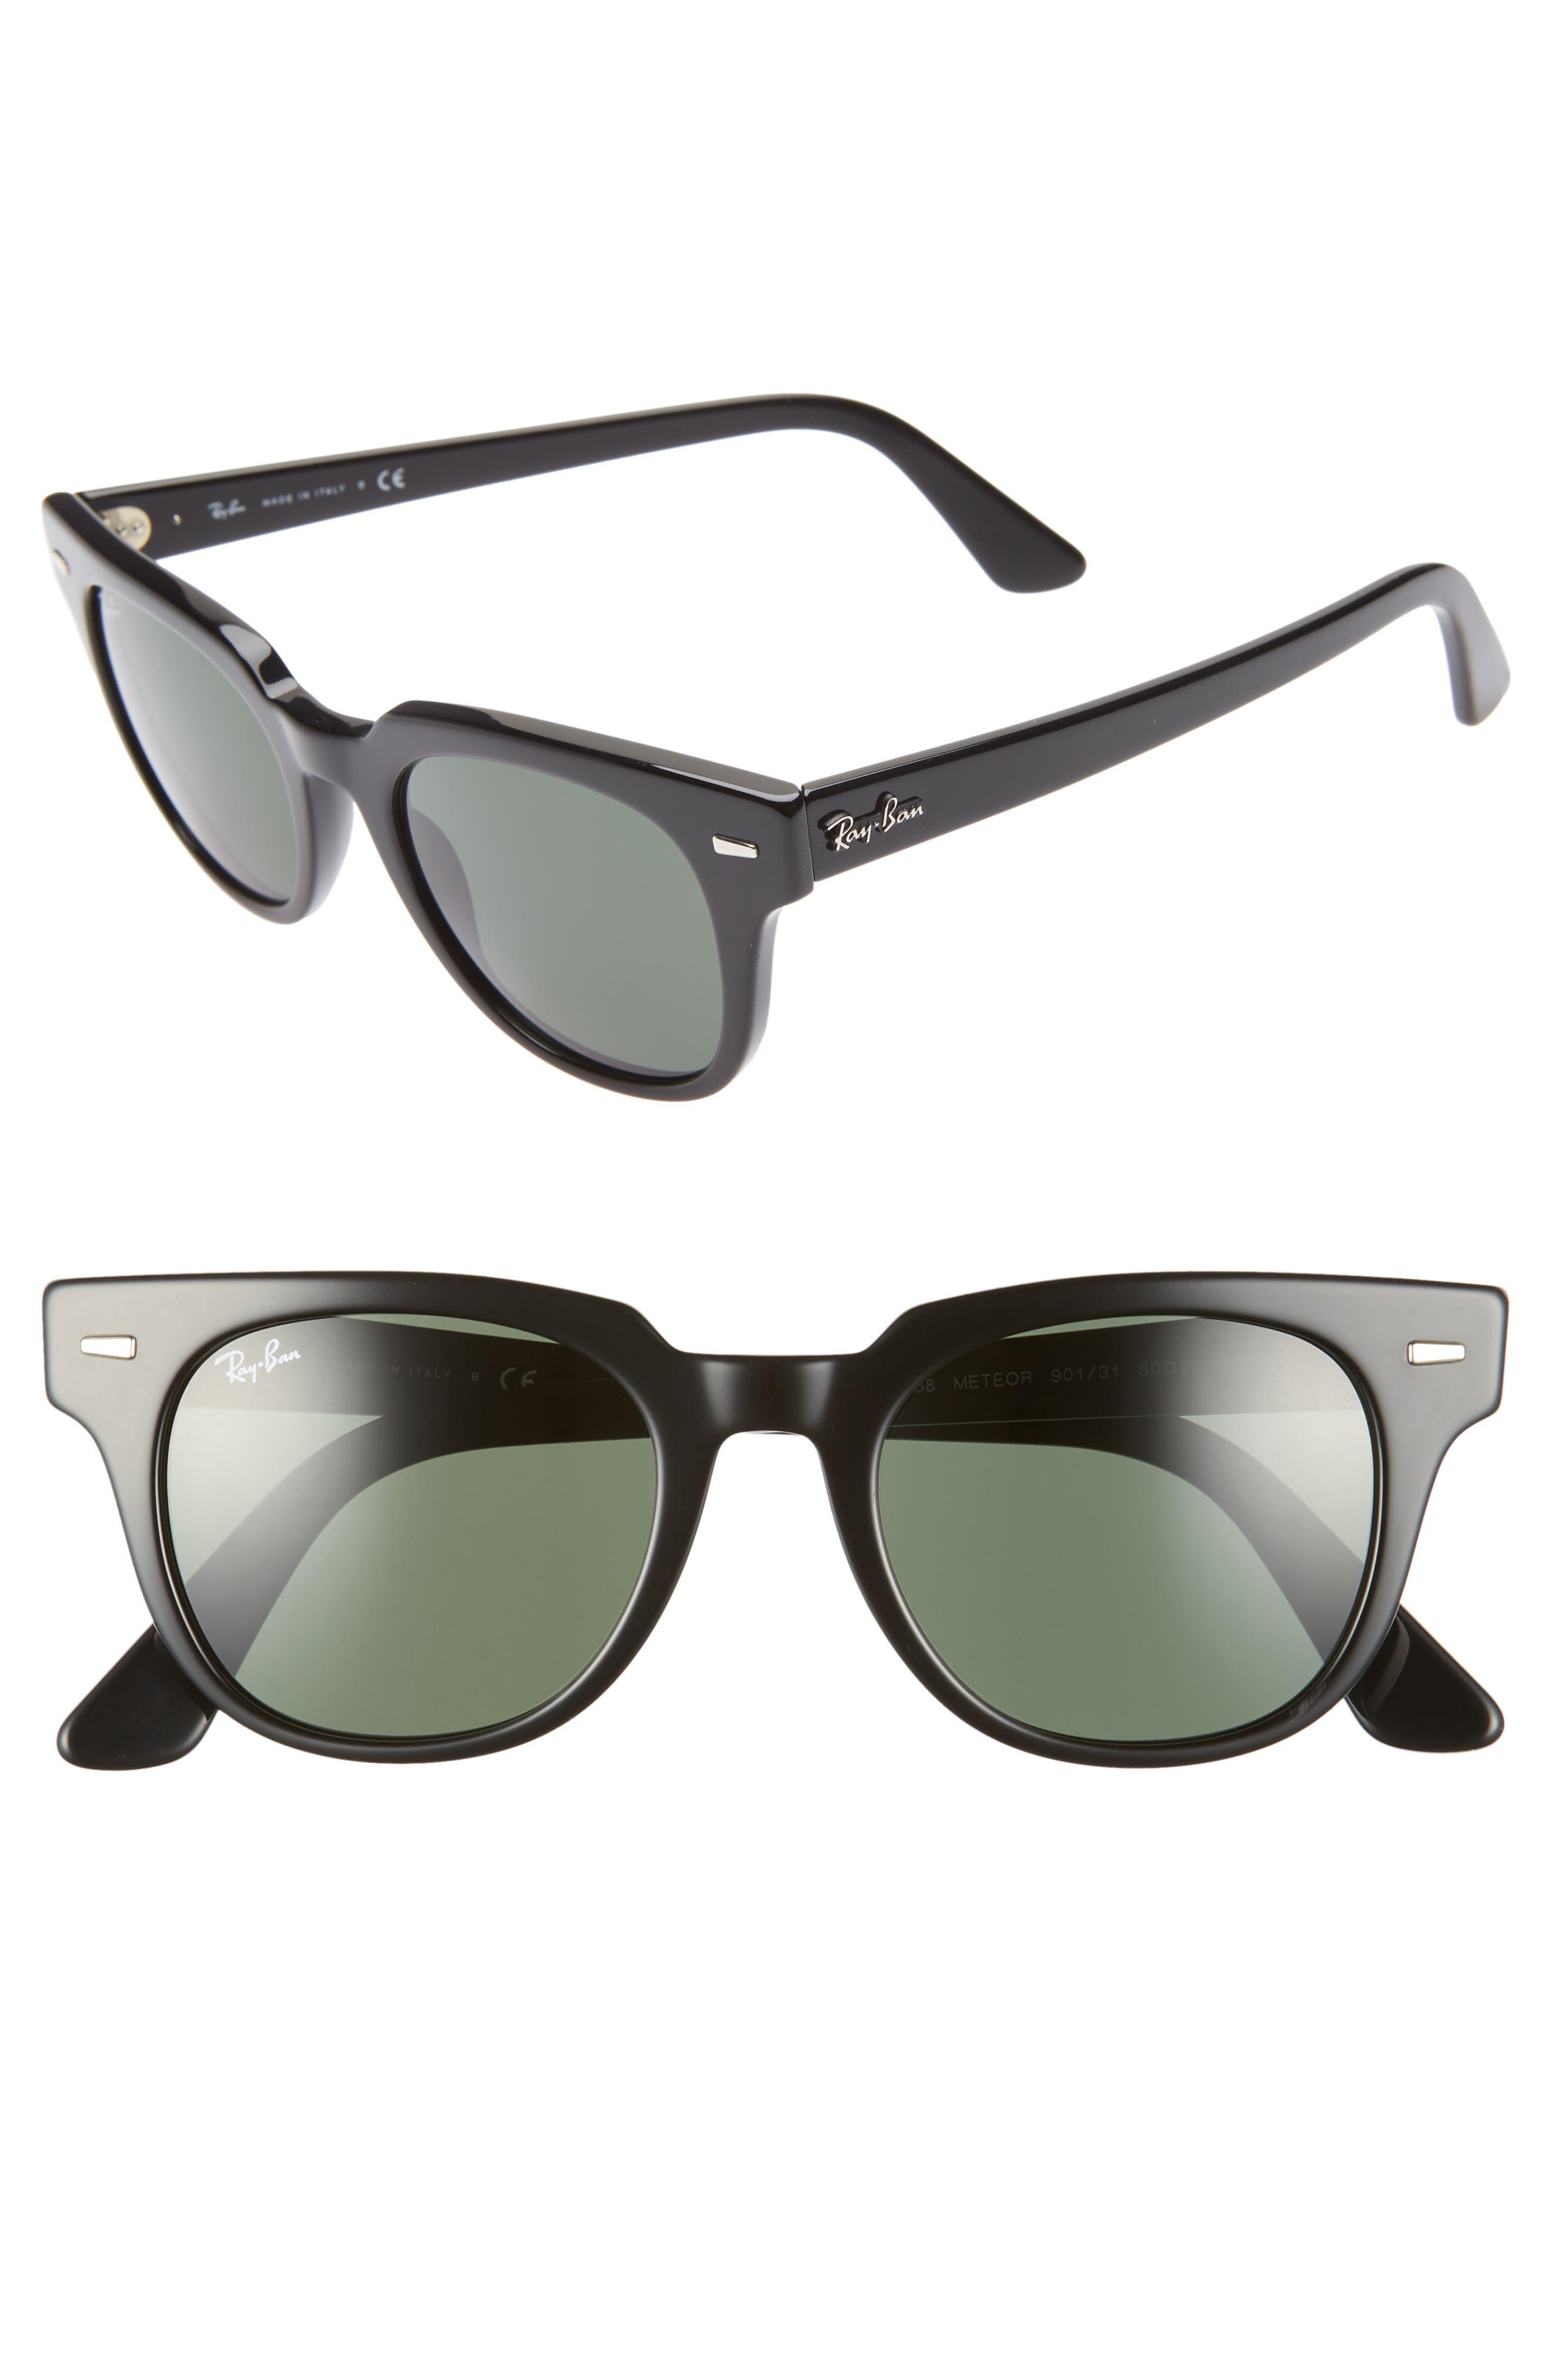 Ray-Ban Meteor 50Mm Wayfarer Sunglasses - Black Solid